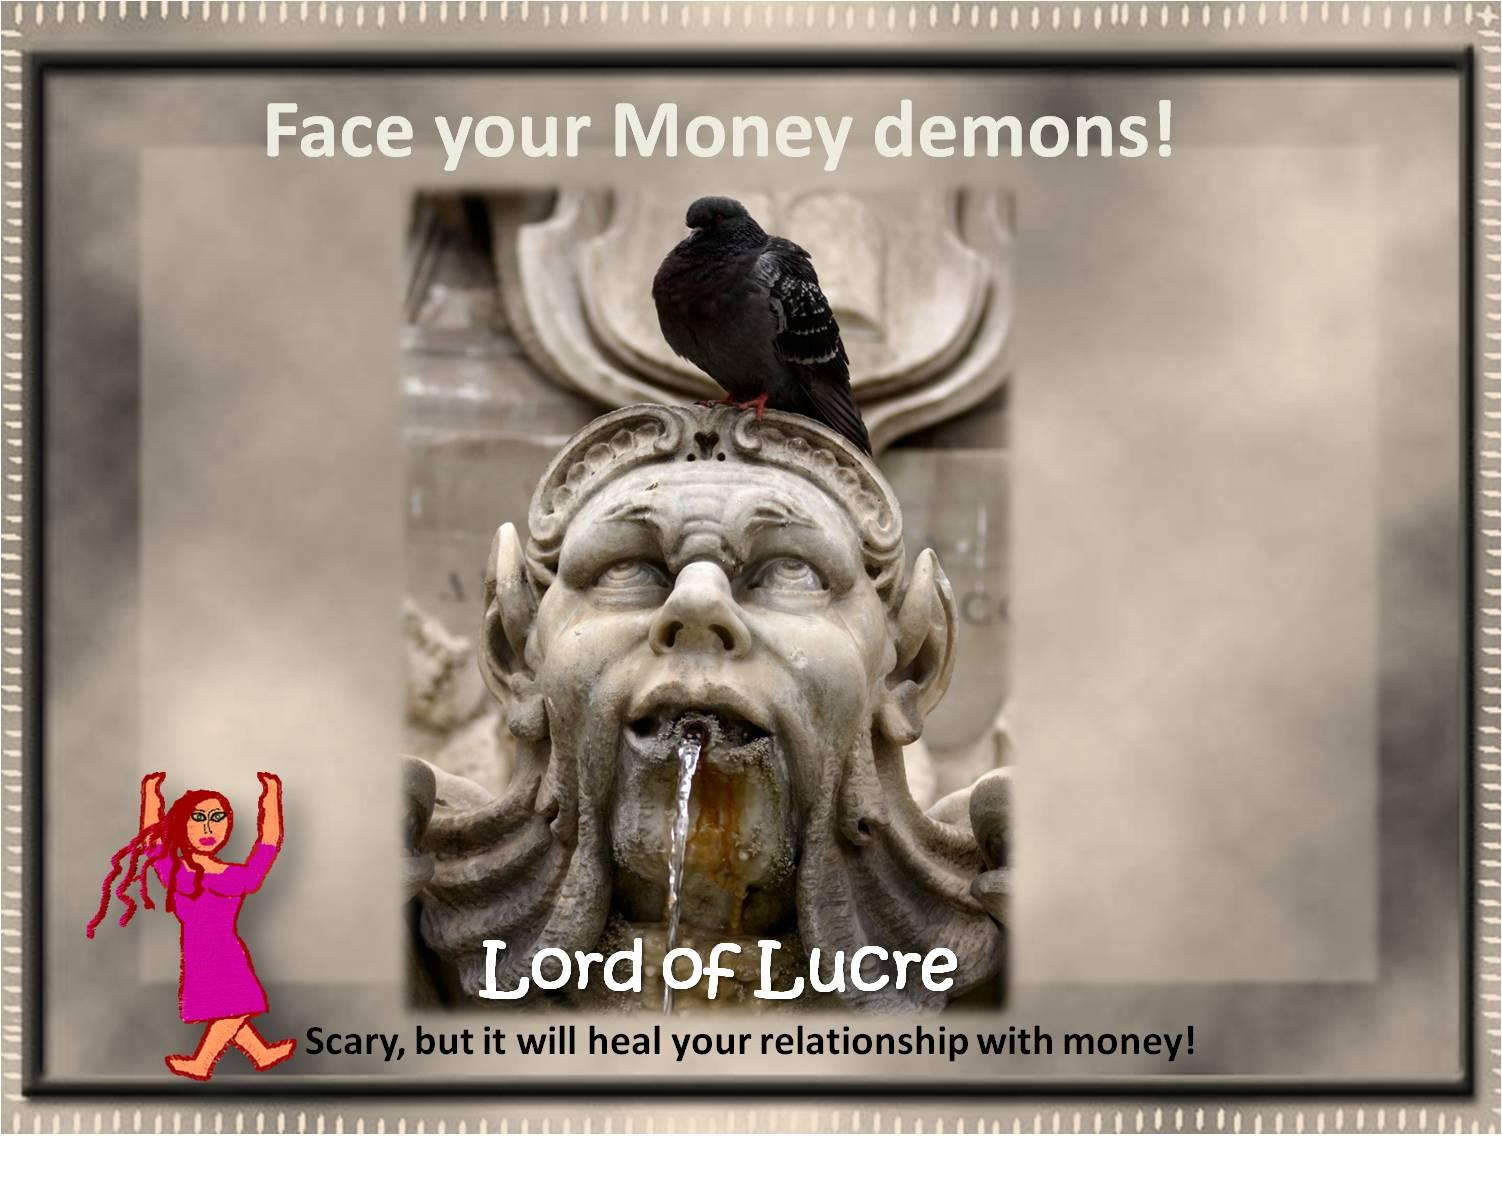 dreamexpress-virtualtourB-slide11-lord-lucre